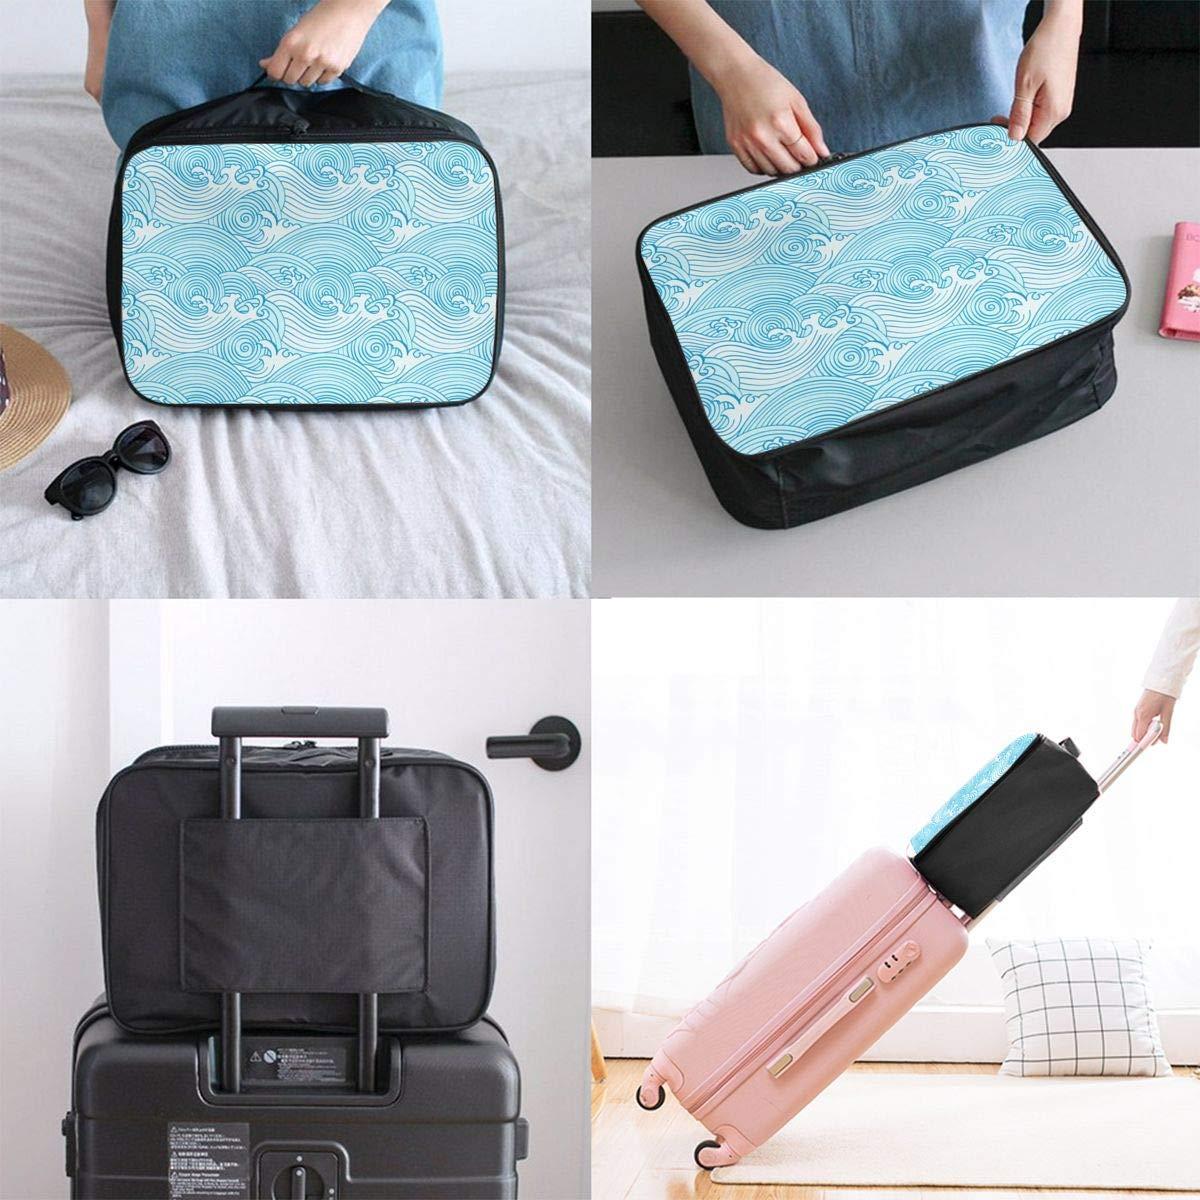 Japanese Waves Pattern JTRVW Travel Luggage Trolley Bag Portable Lightweight Suitcases Duffle Tote Bag Handbag